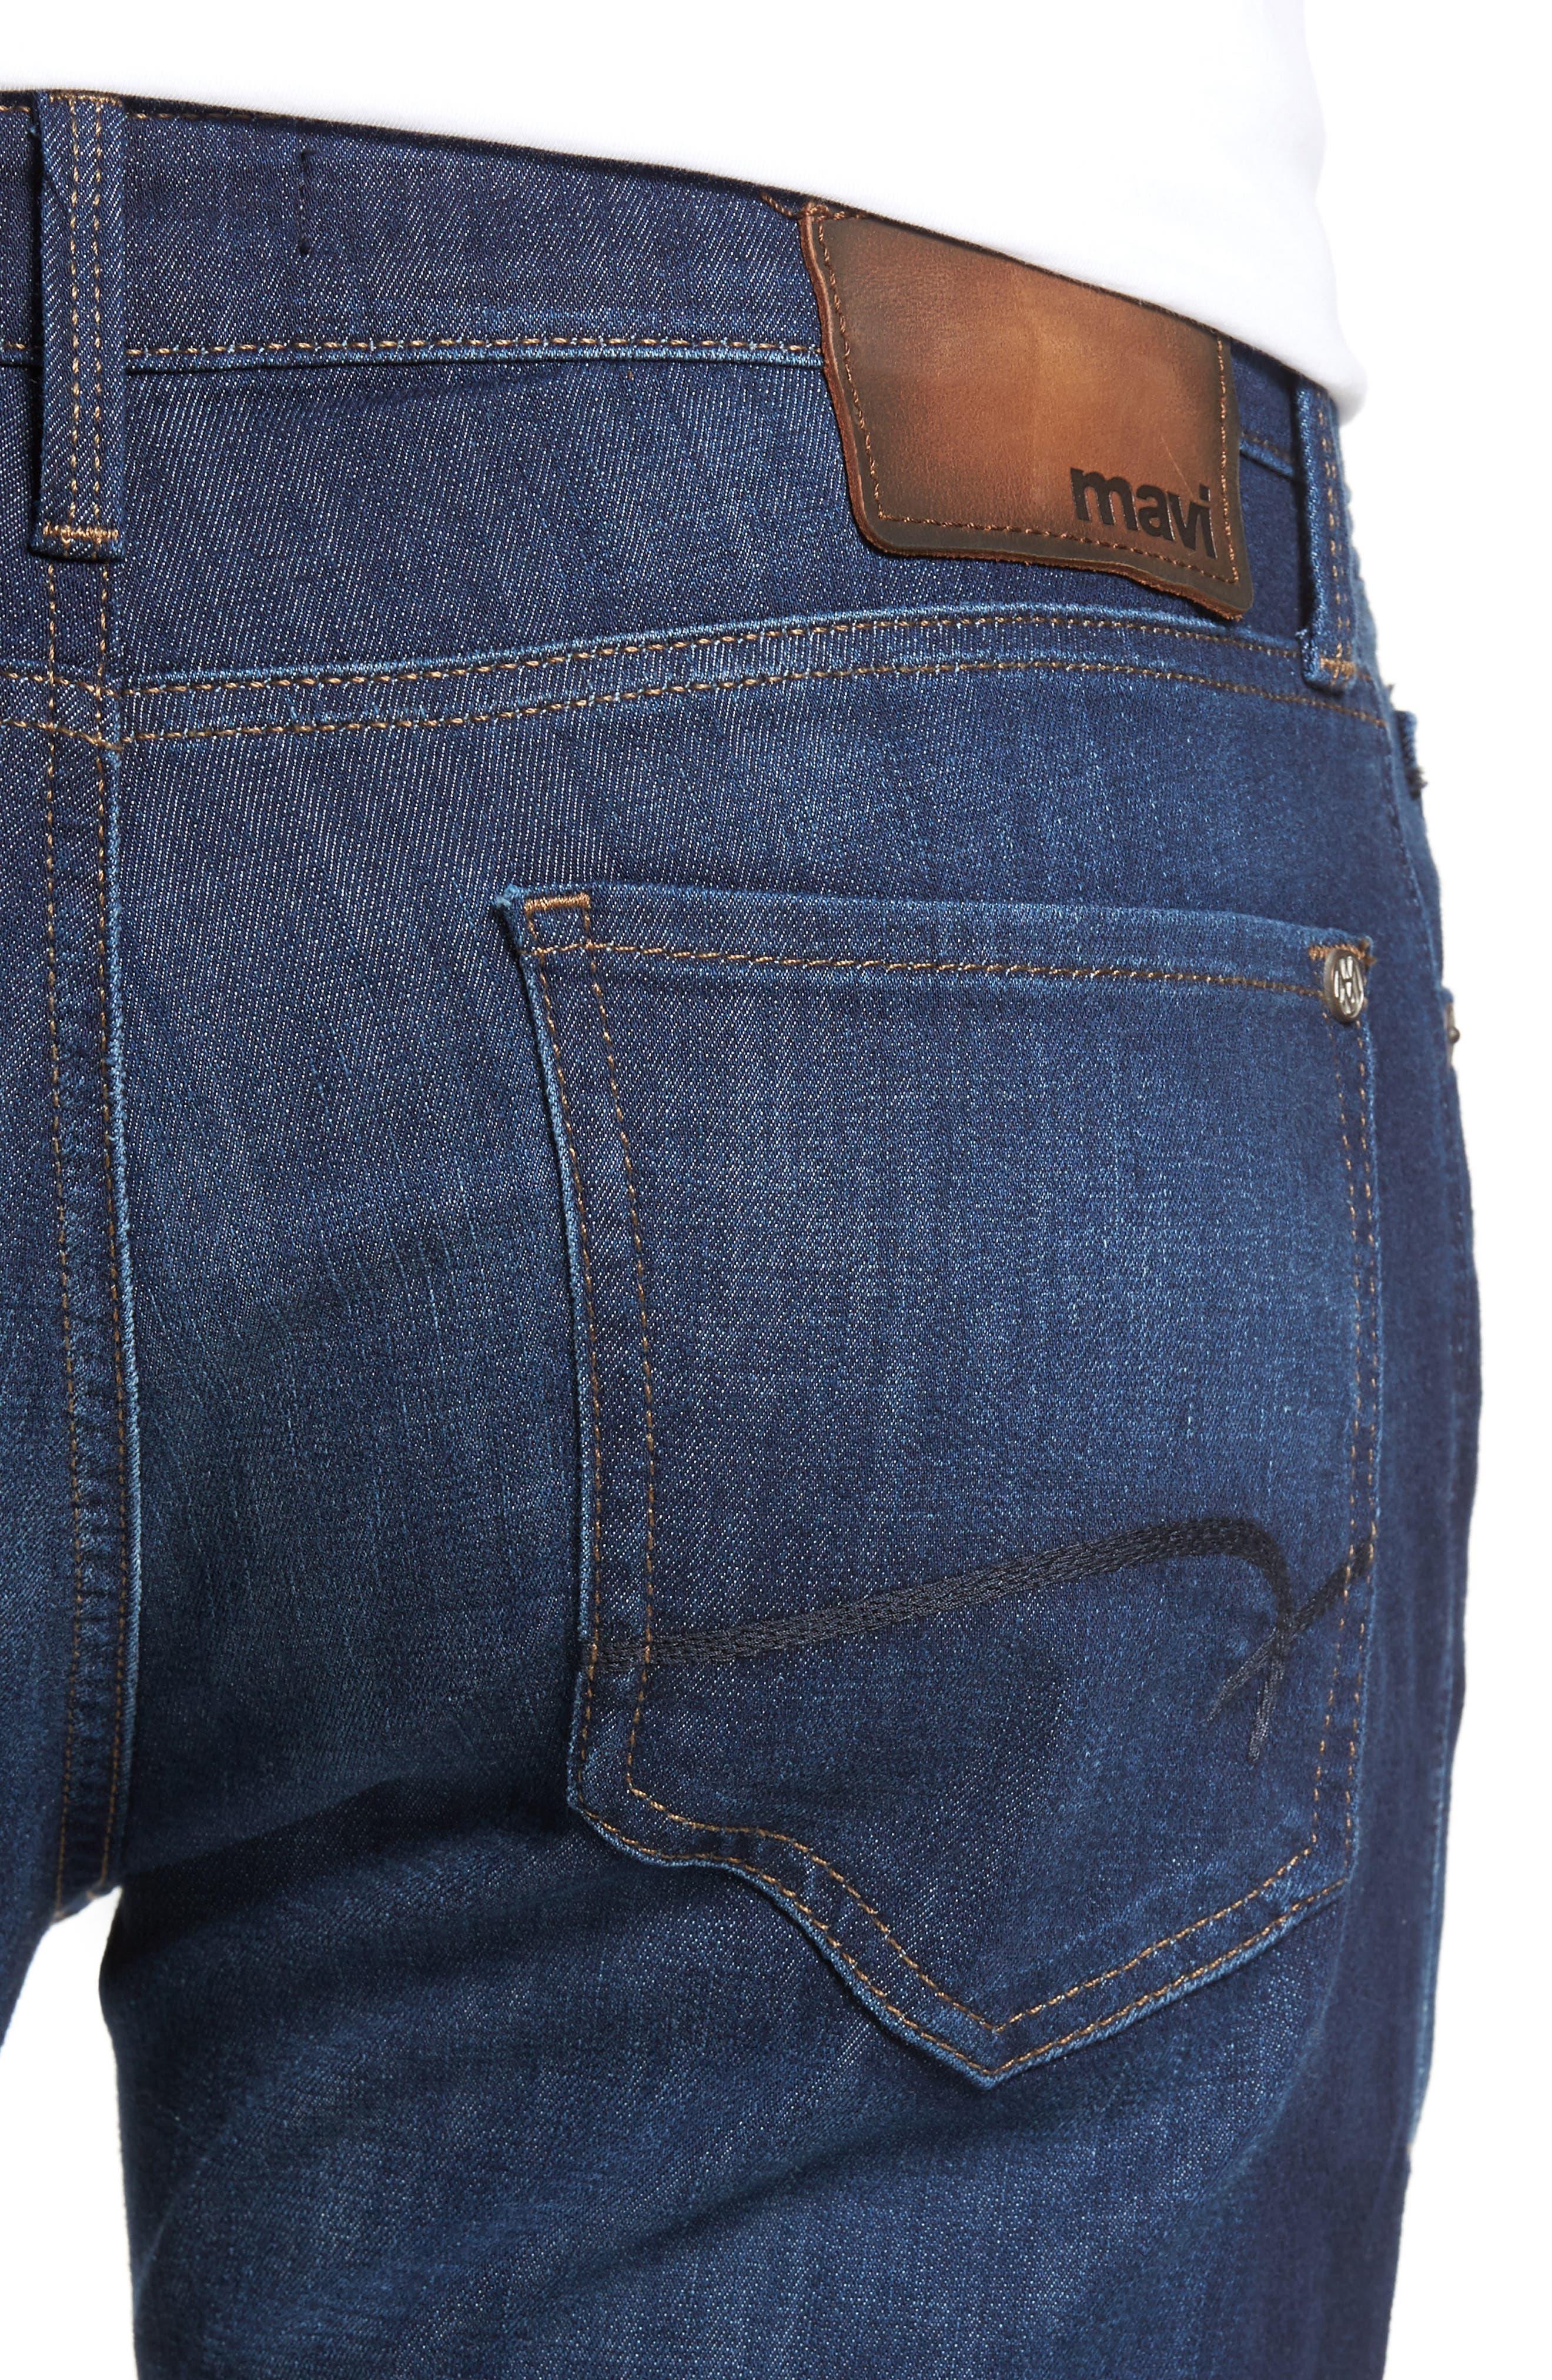 Marcus Slim Straight Leg Jeans,                             Alternate thumbnail 4, color,                             INDIGO PORTLAND